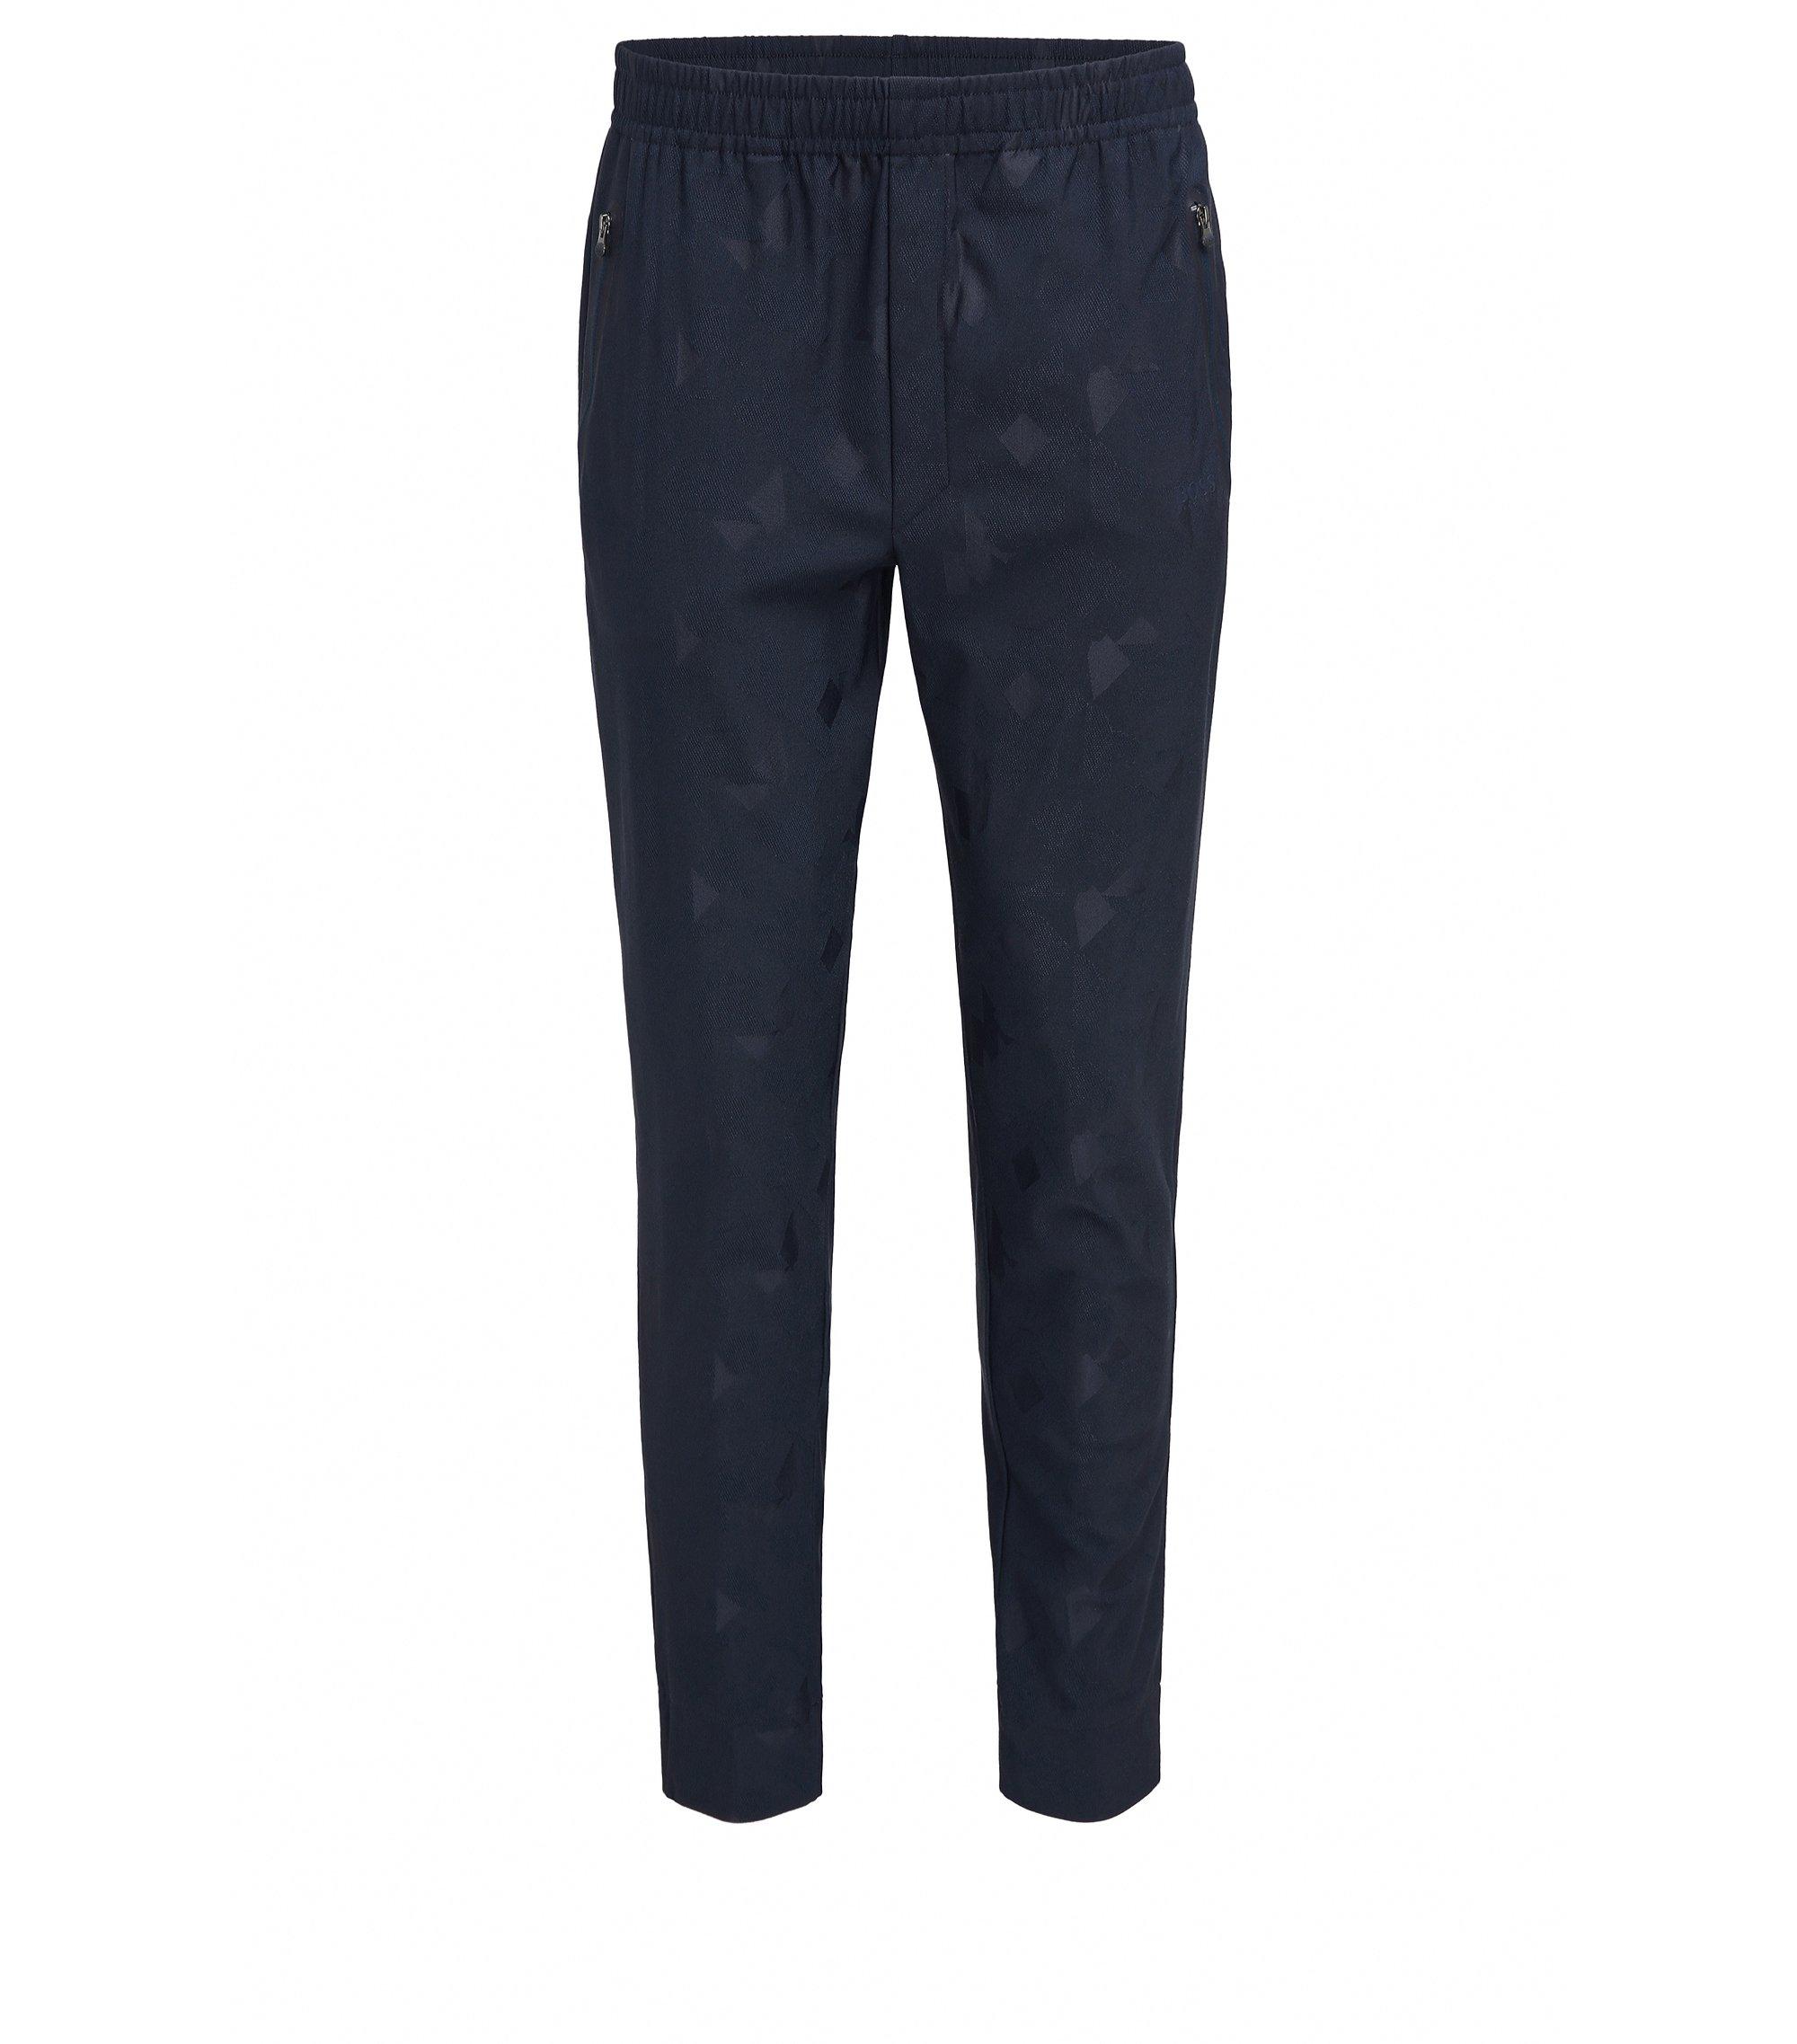 Slim-fit broek in technisch jacquard, Donkerblauw